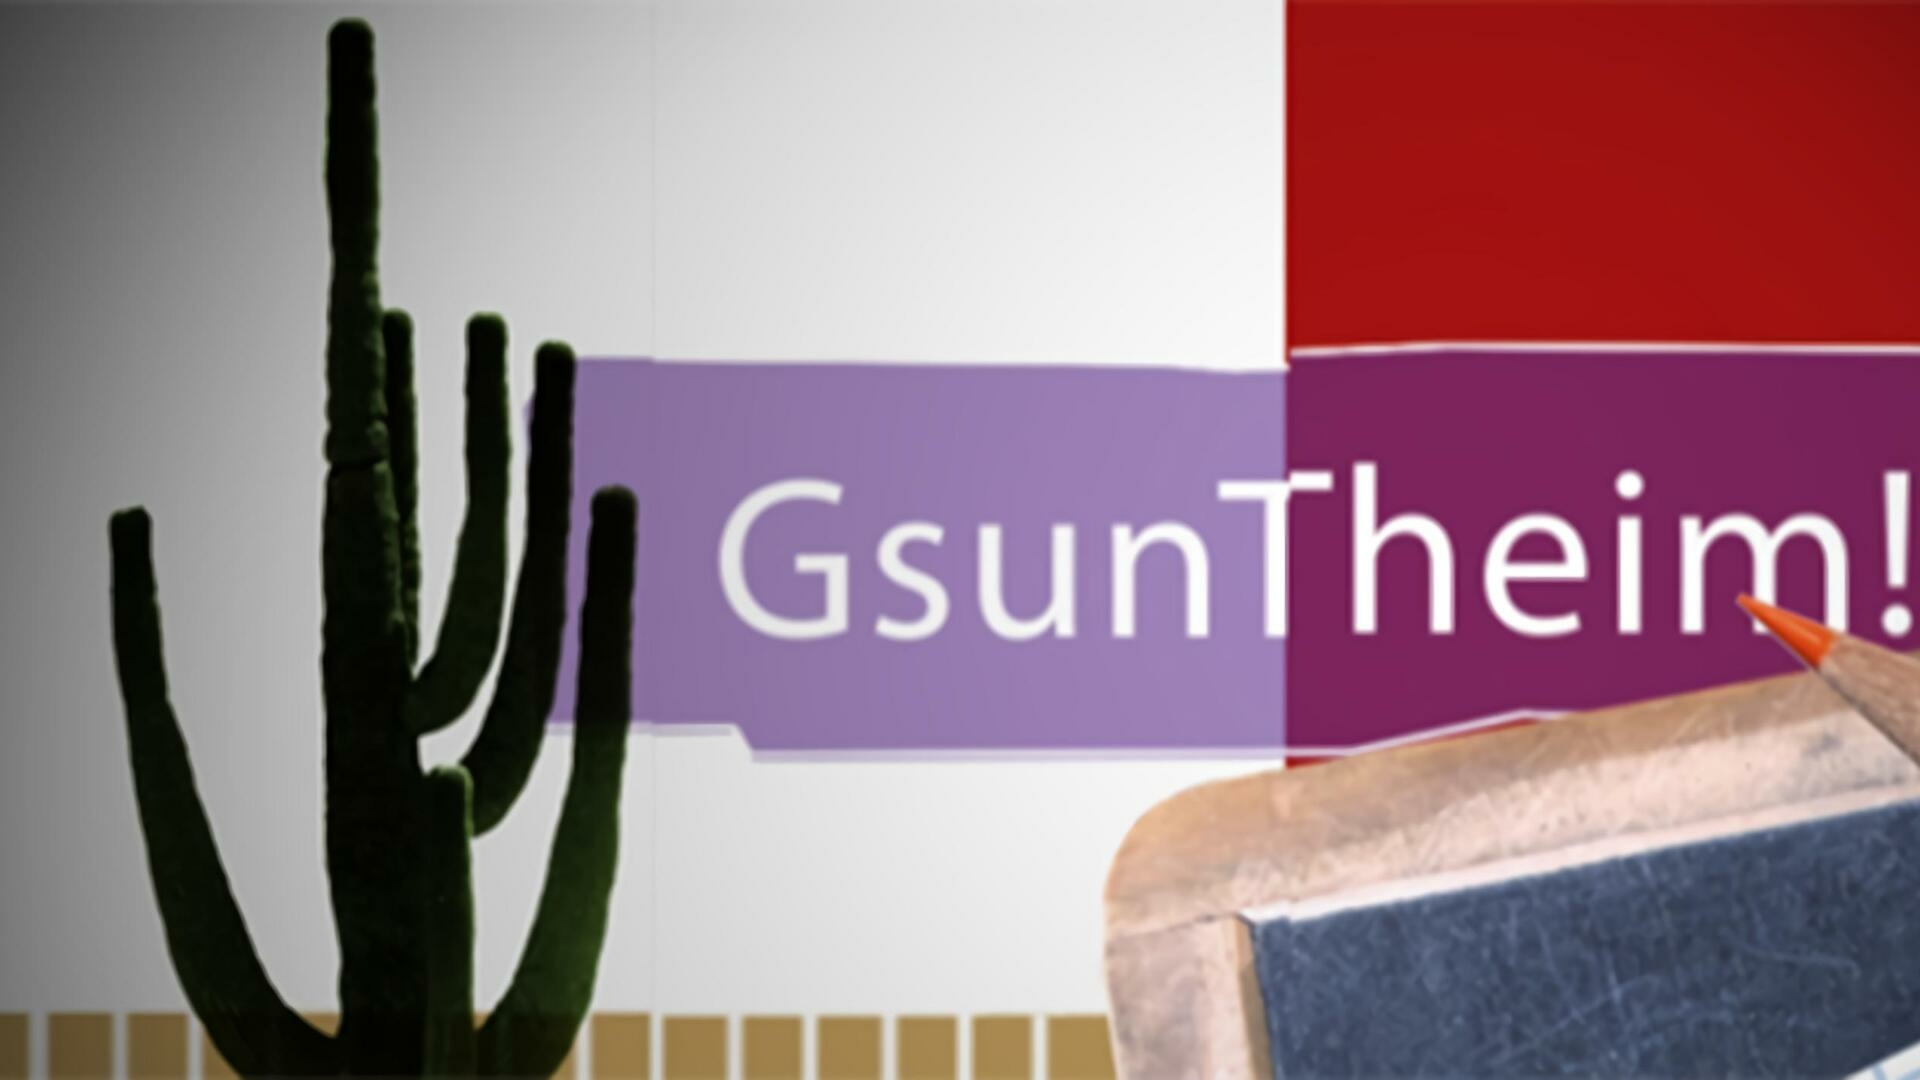 GsunTheim